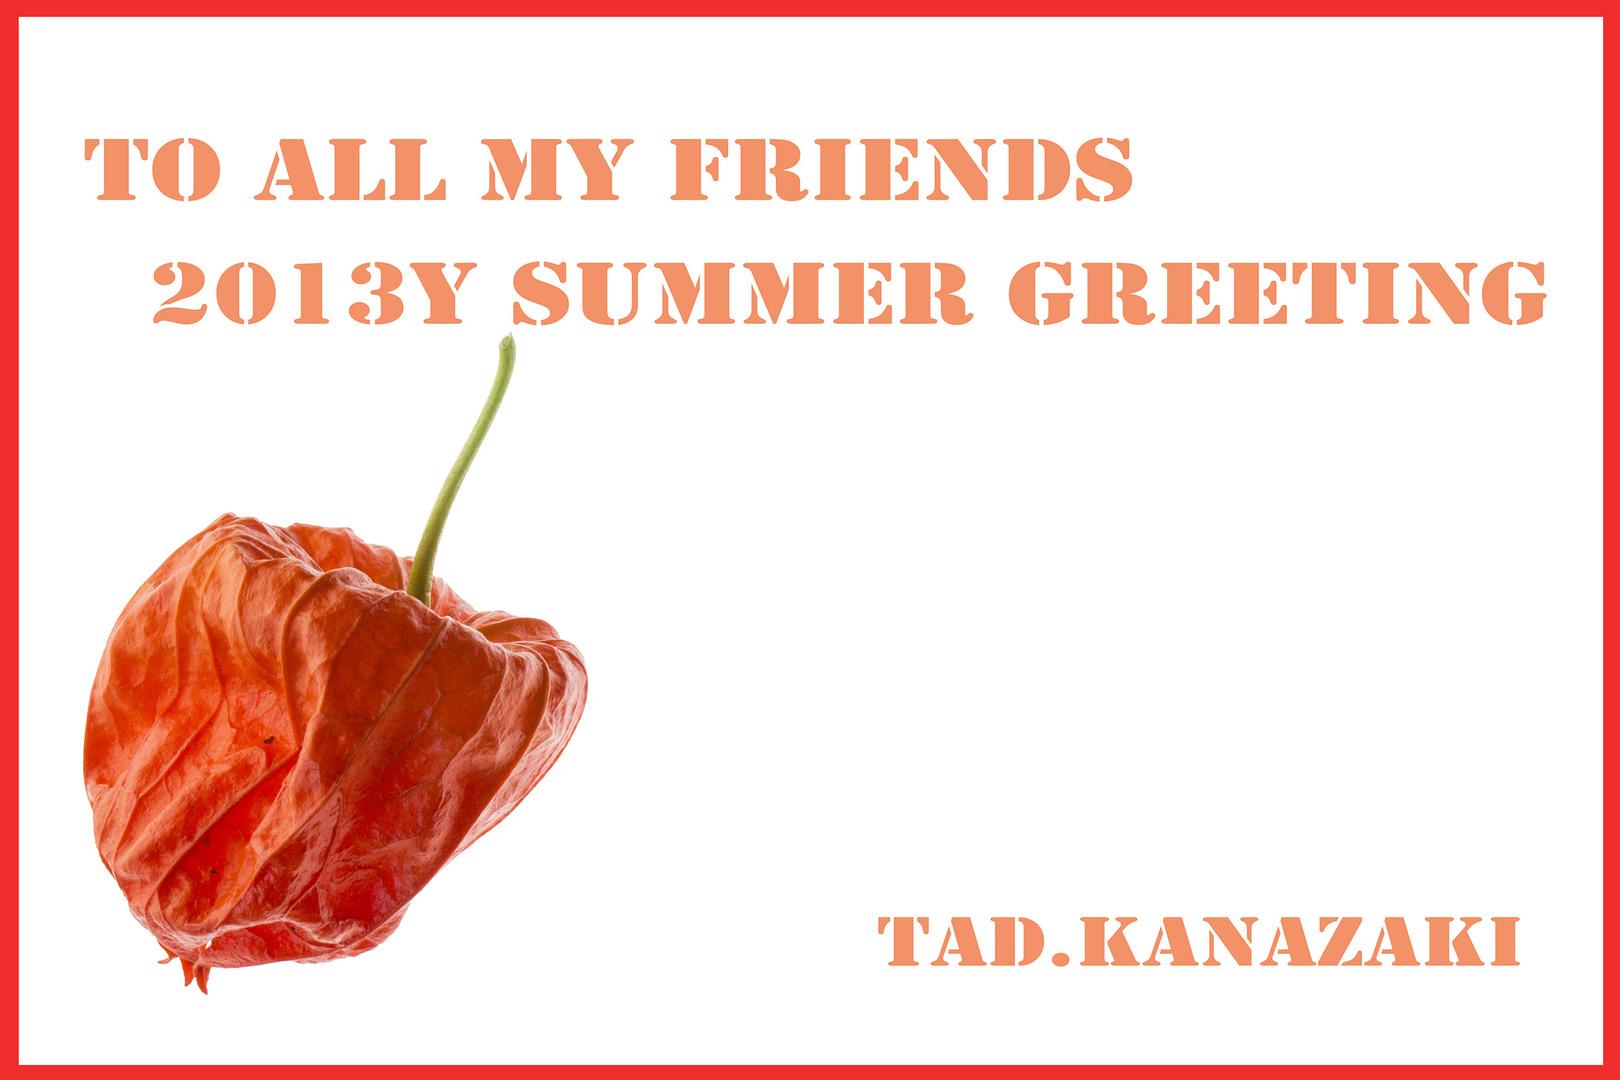 Summer Greeting